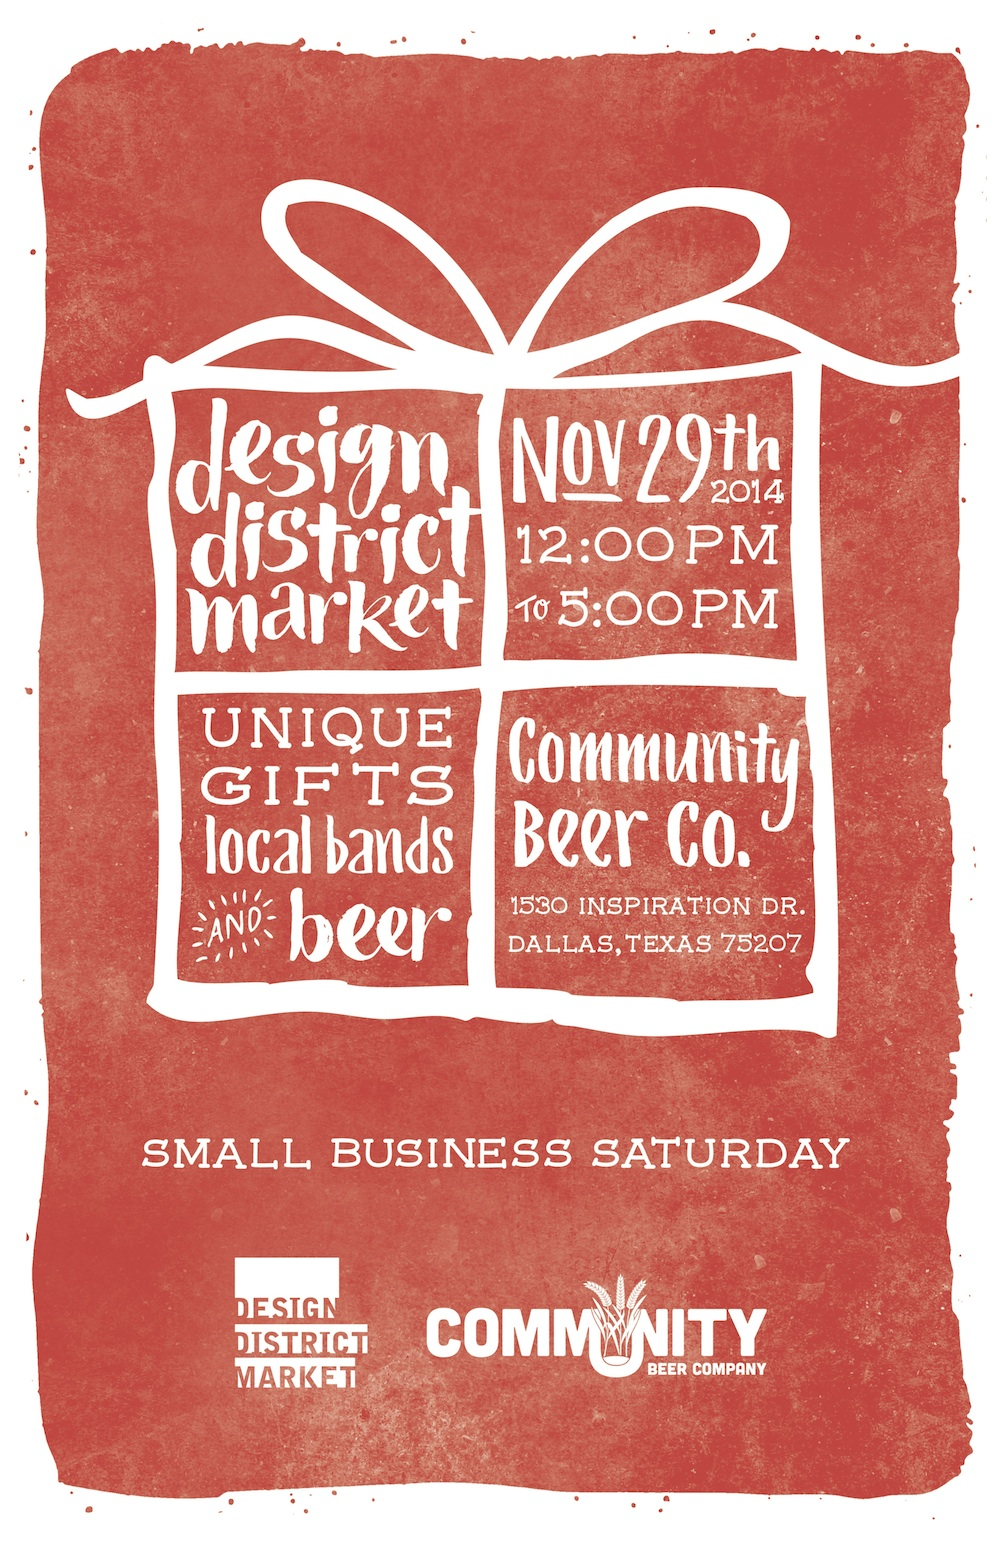 November 29: Small Business Saturday at Community Beer